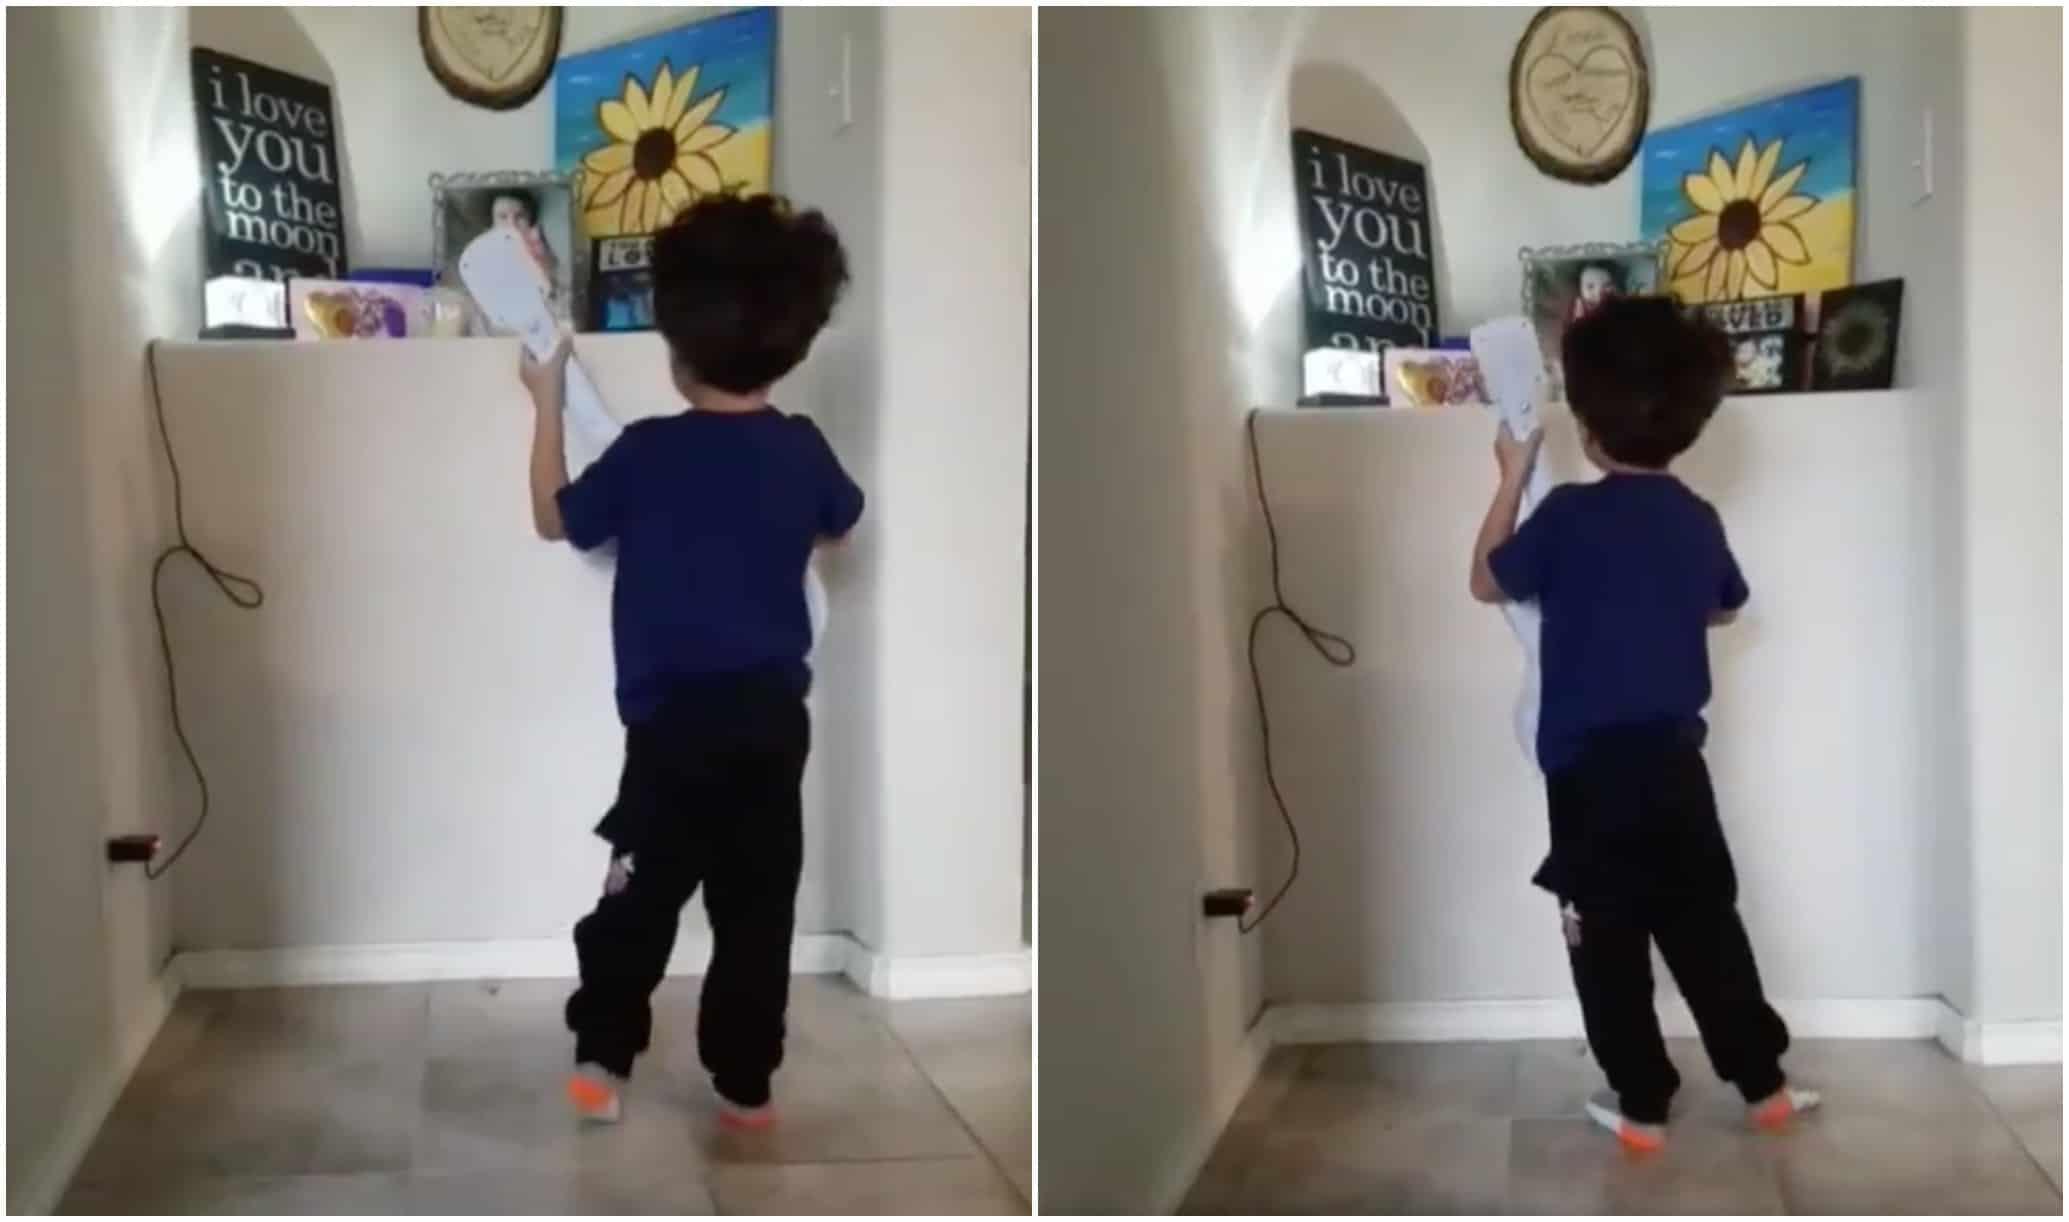 Niño canta 'Remember Me', de 'Coco', a su difunta hermana. Pulzo.